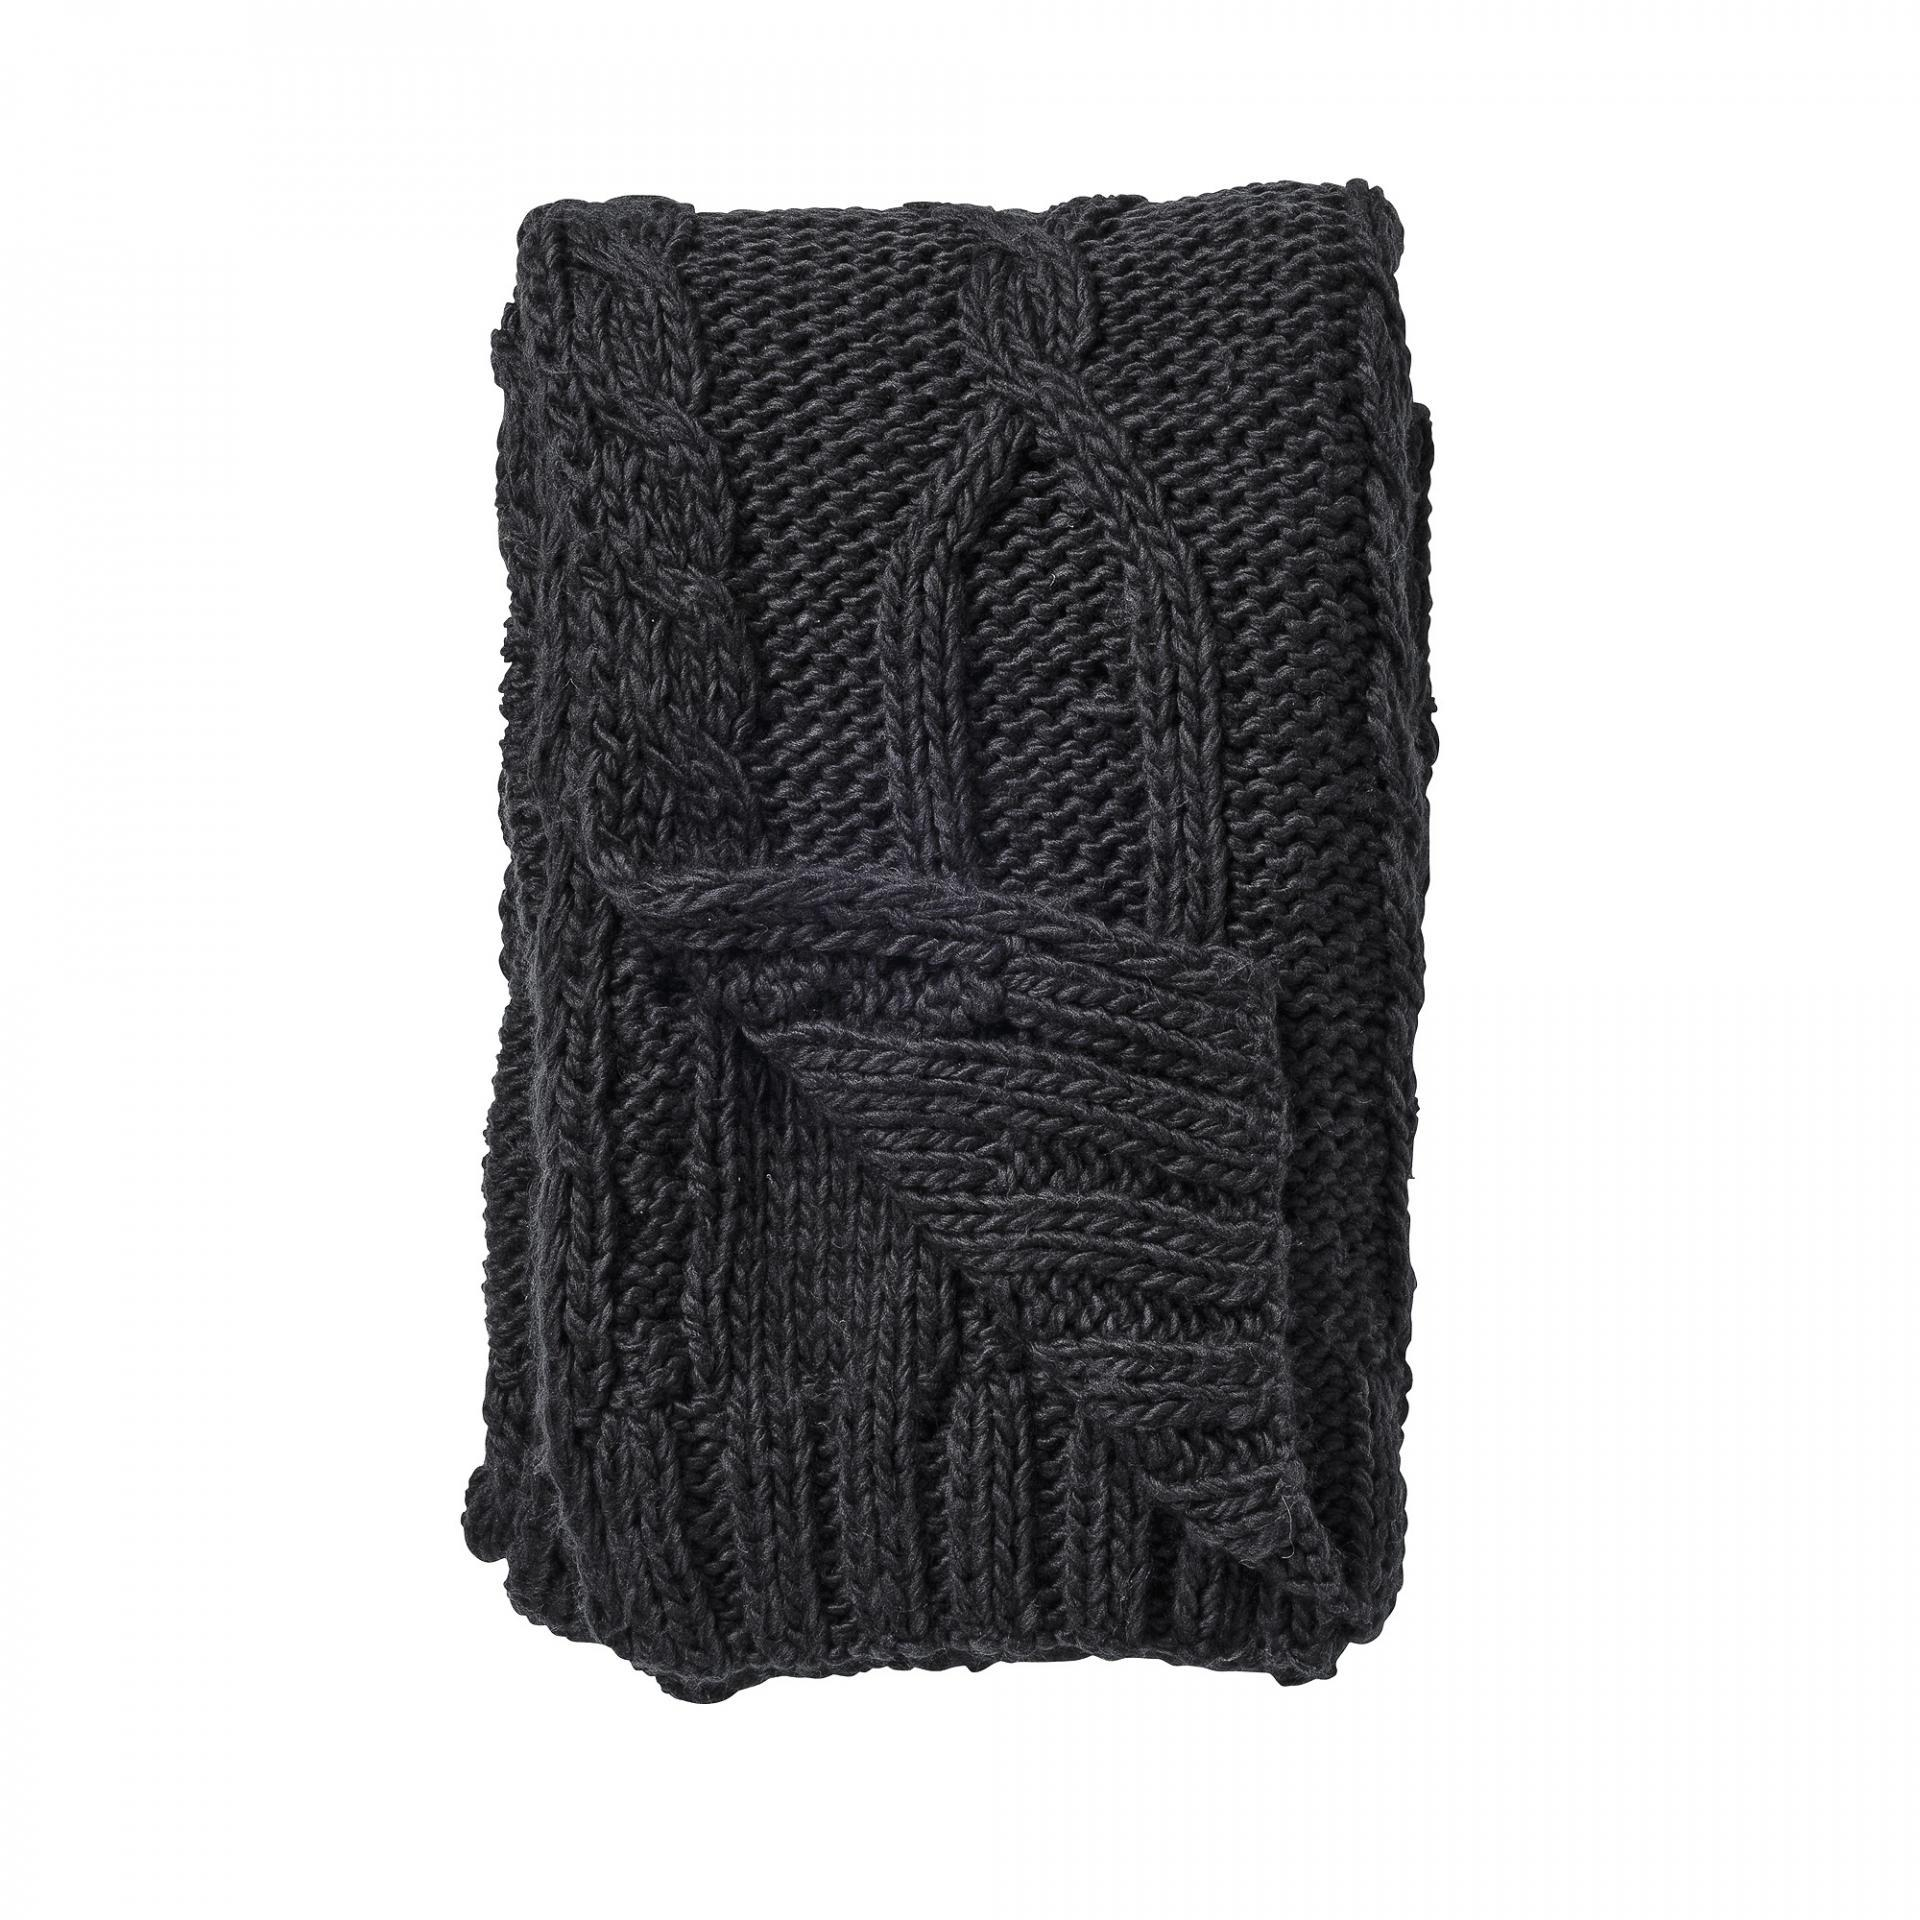 Bloomingville Pletený pléd Strikket 152 x 127 cm, černá barva, textil